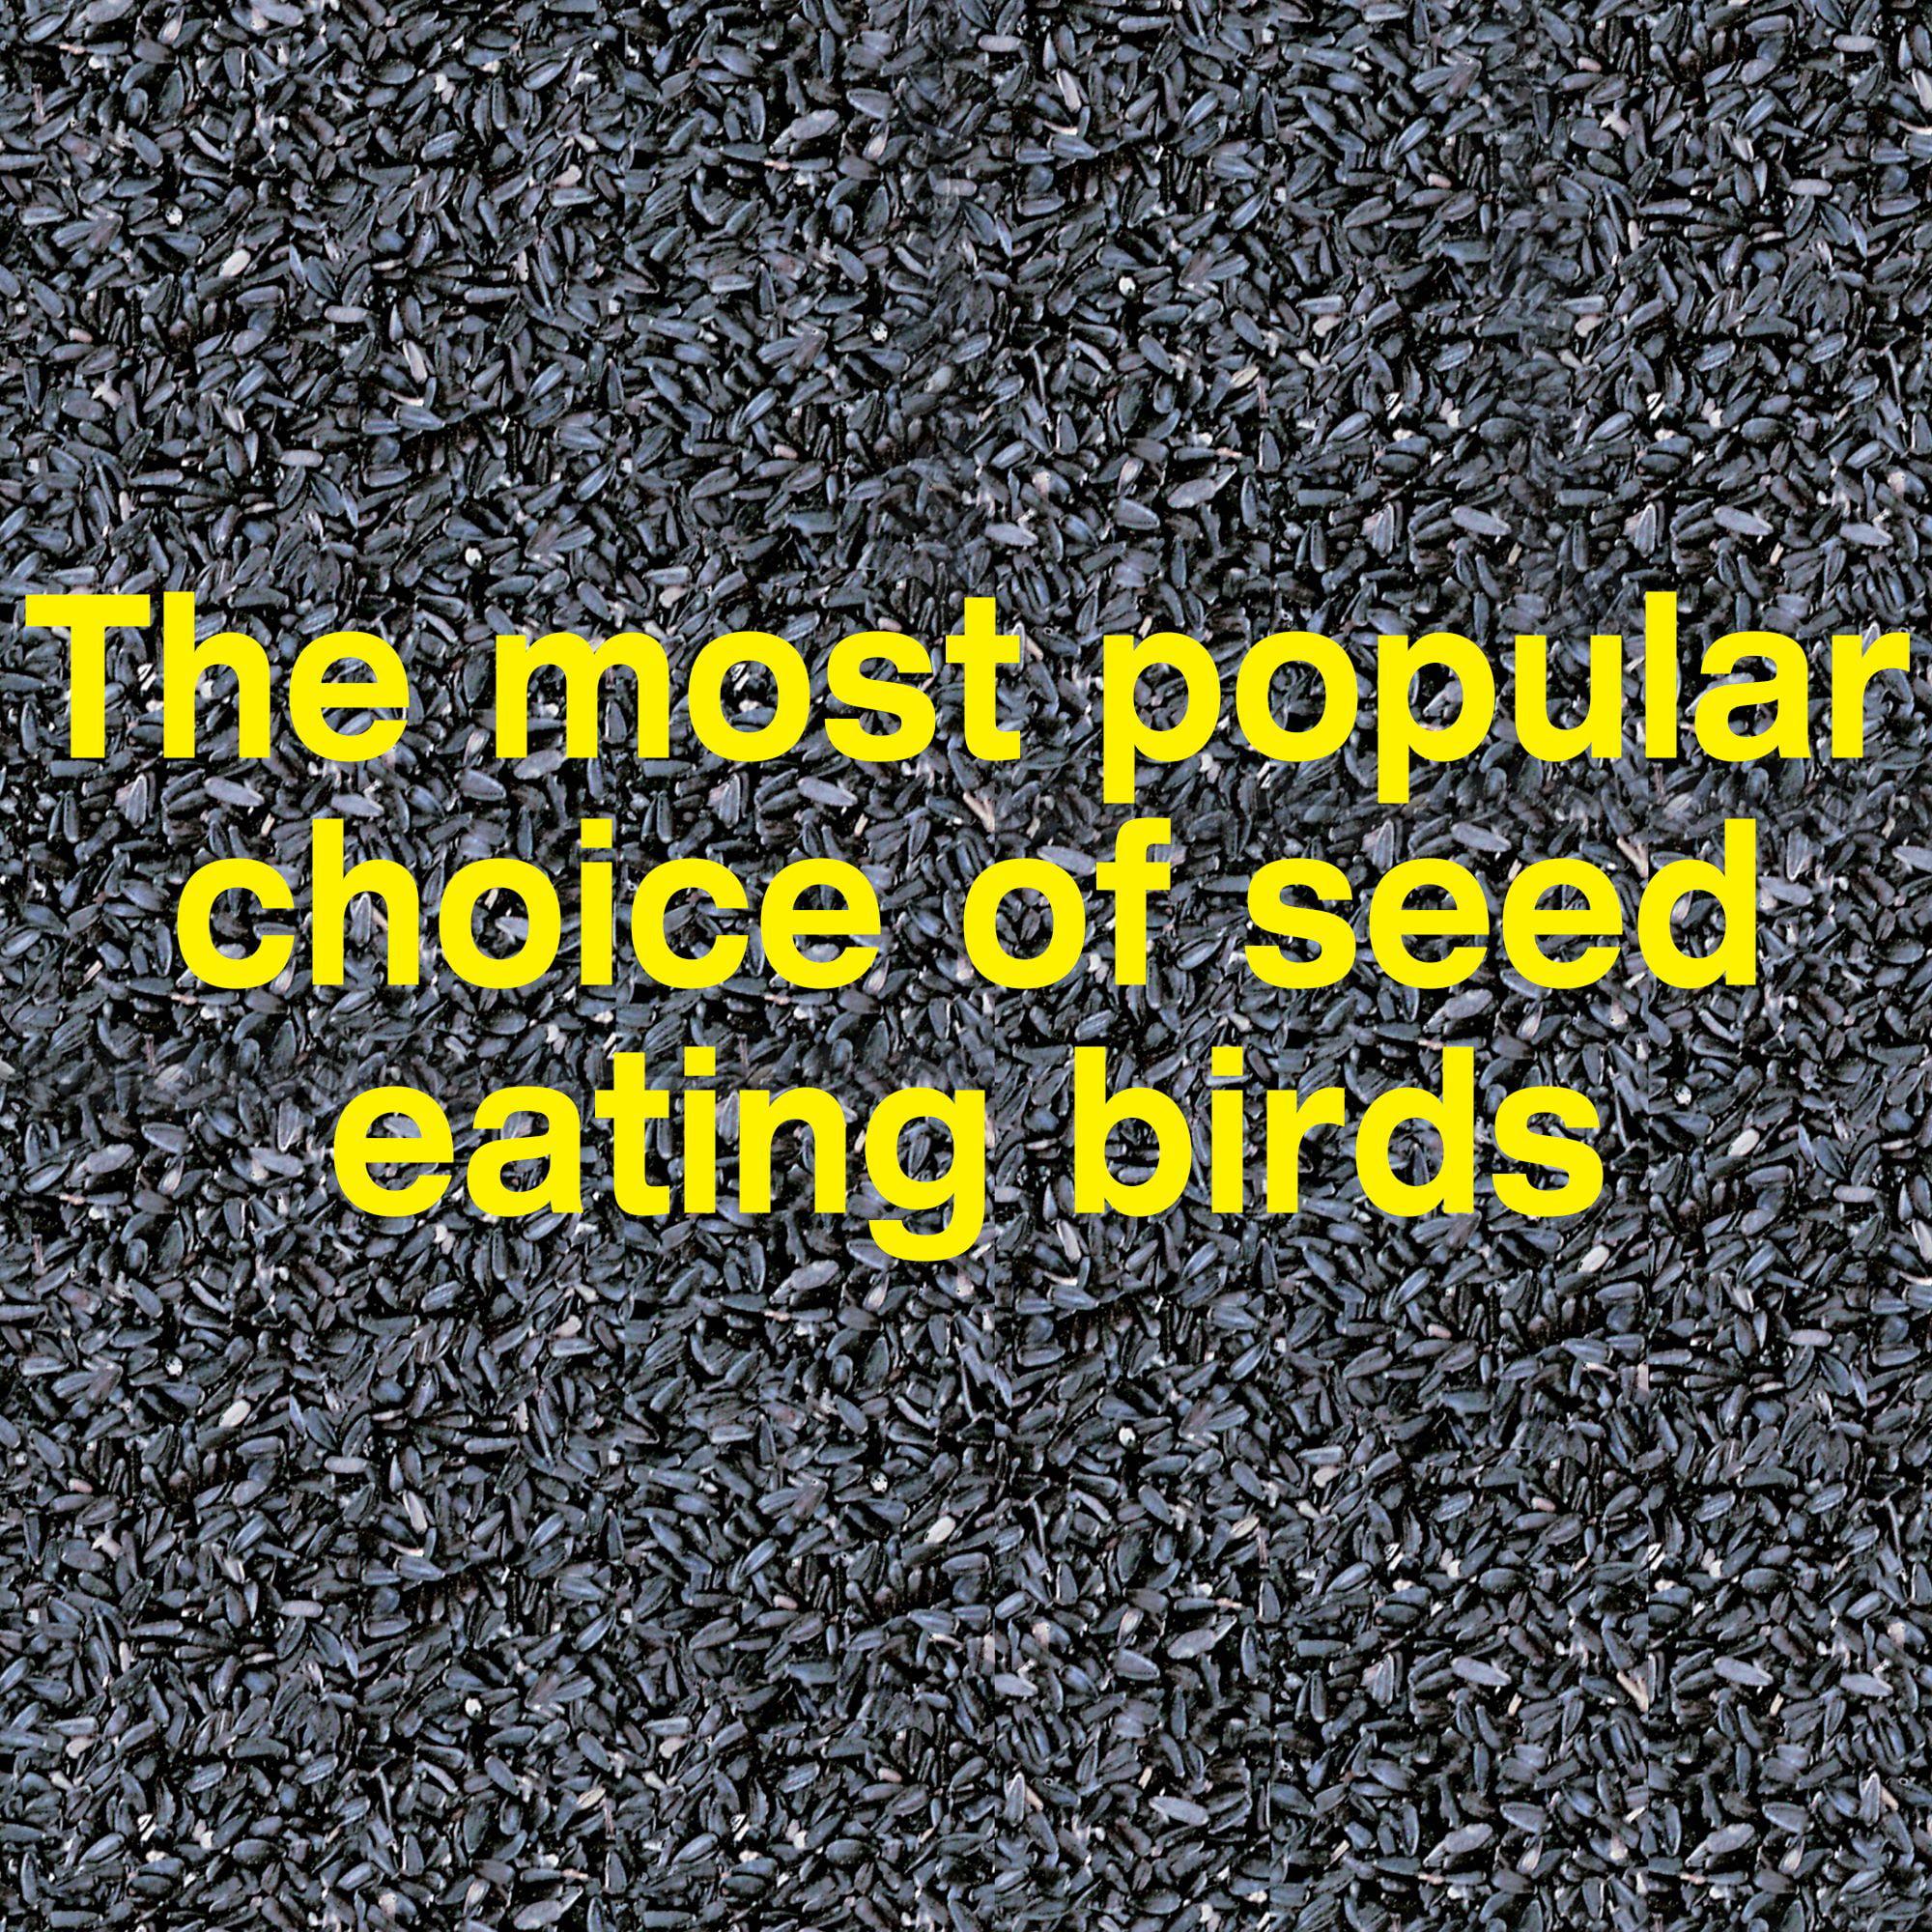 WILD BIRD FEED FOOD SEED 20 Lbs Pennington Black Sunflower Feeder Garden Pet Bag